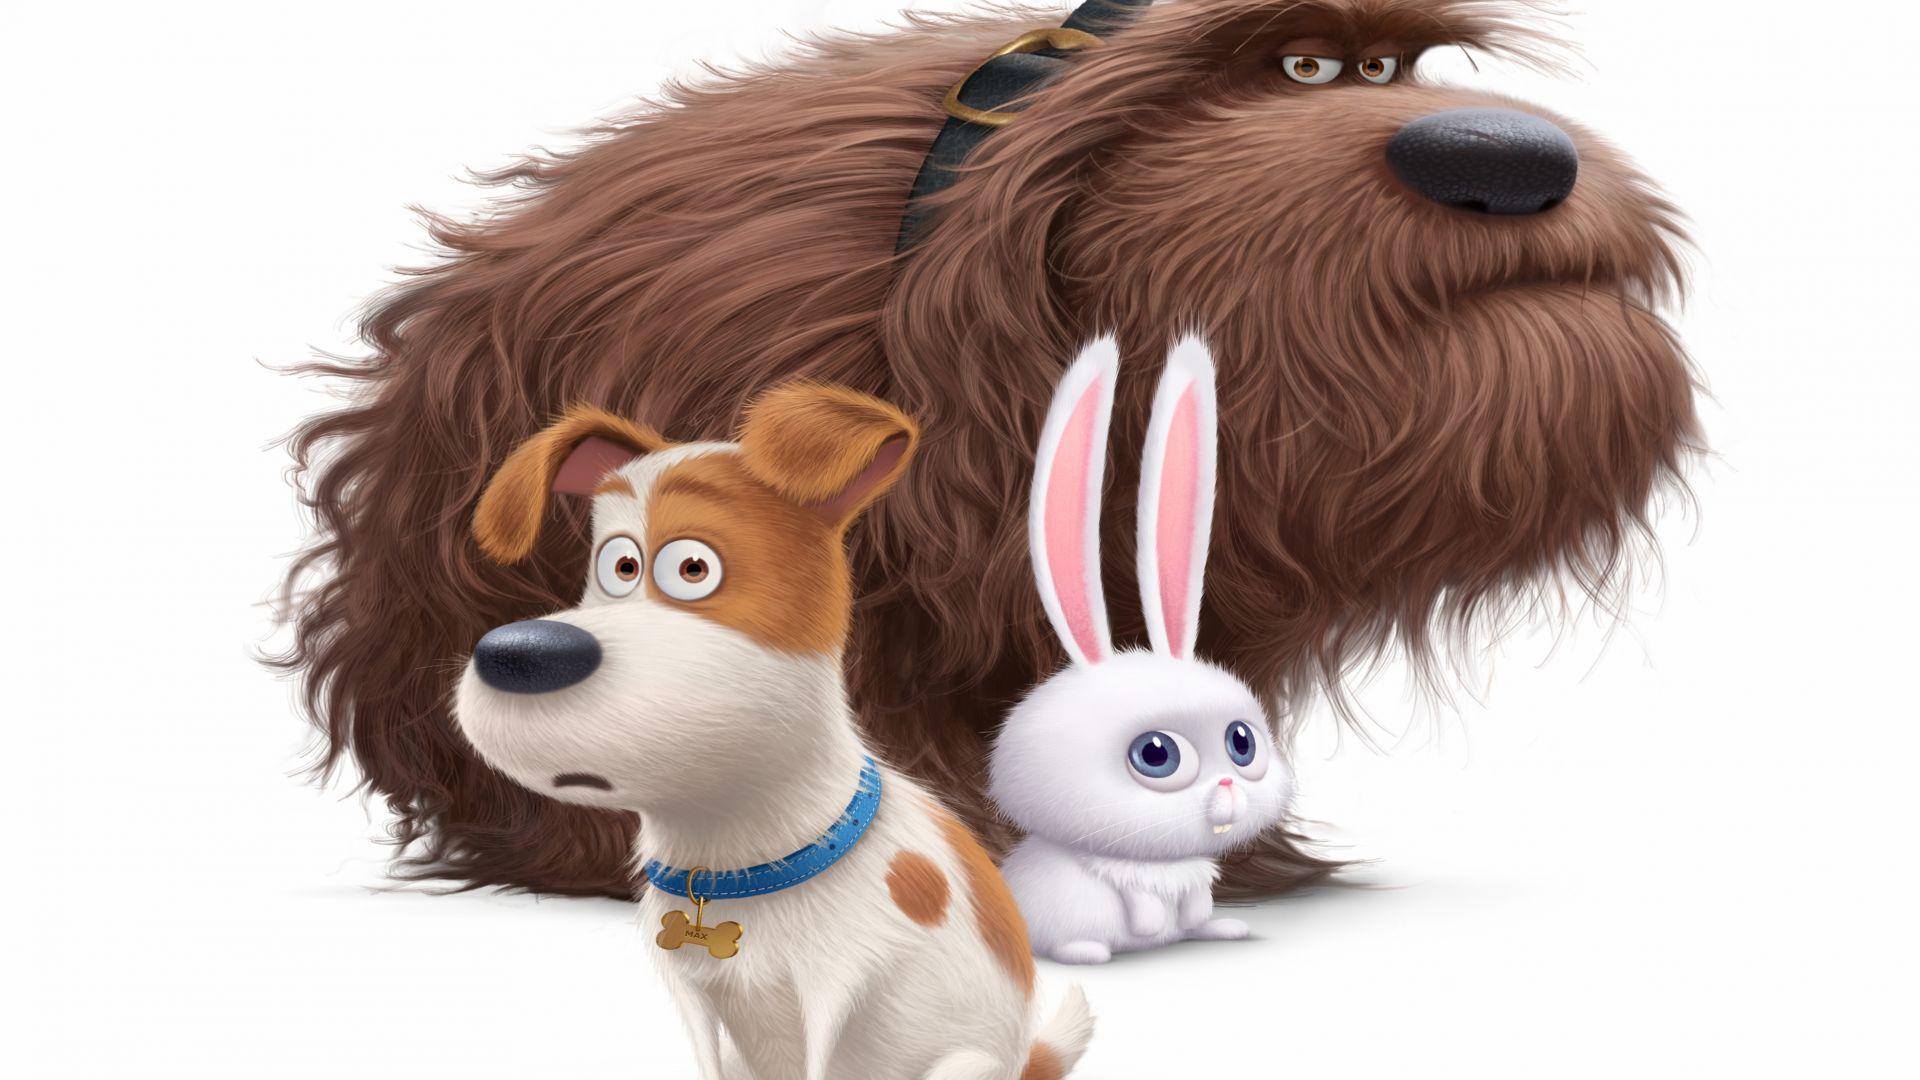 The Secret Life of Pets Wallpaper Movies Animation The Secret Life 1920x1080